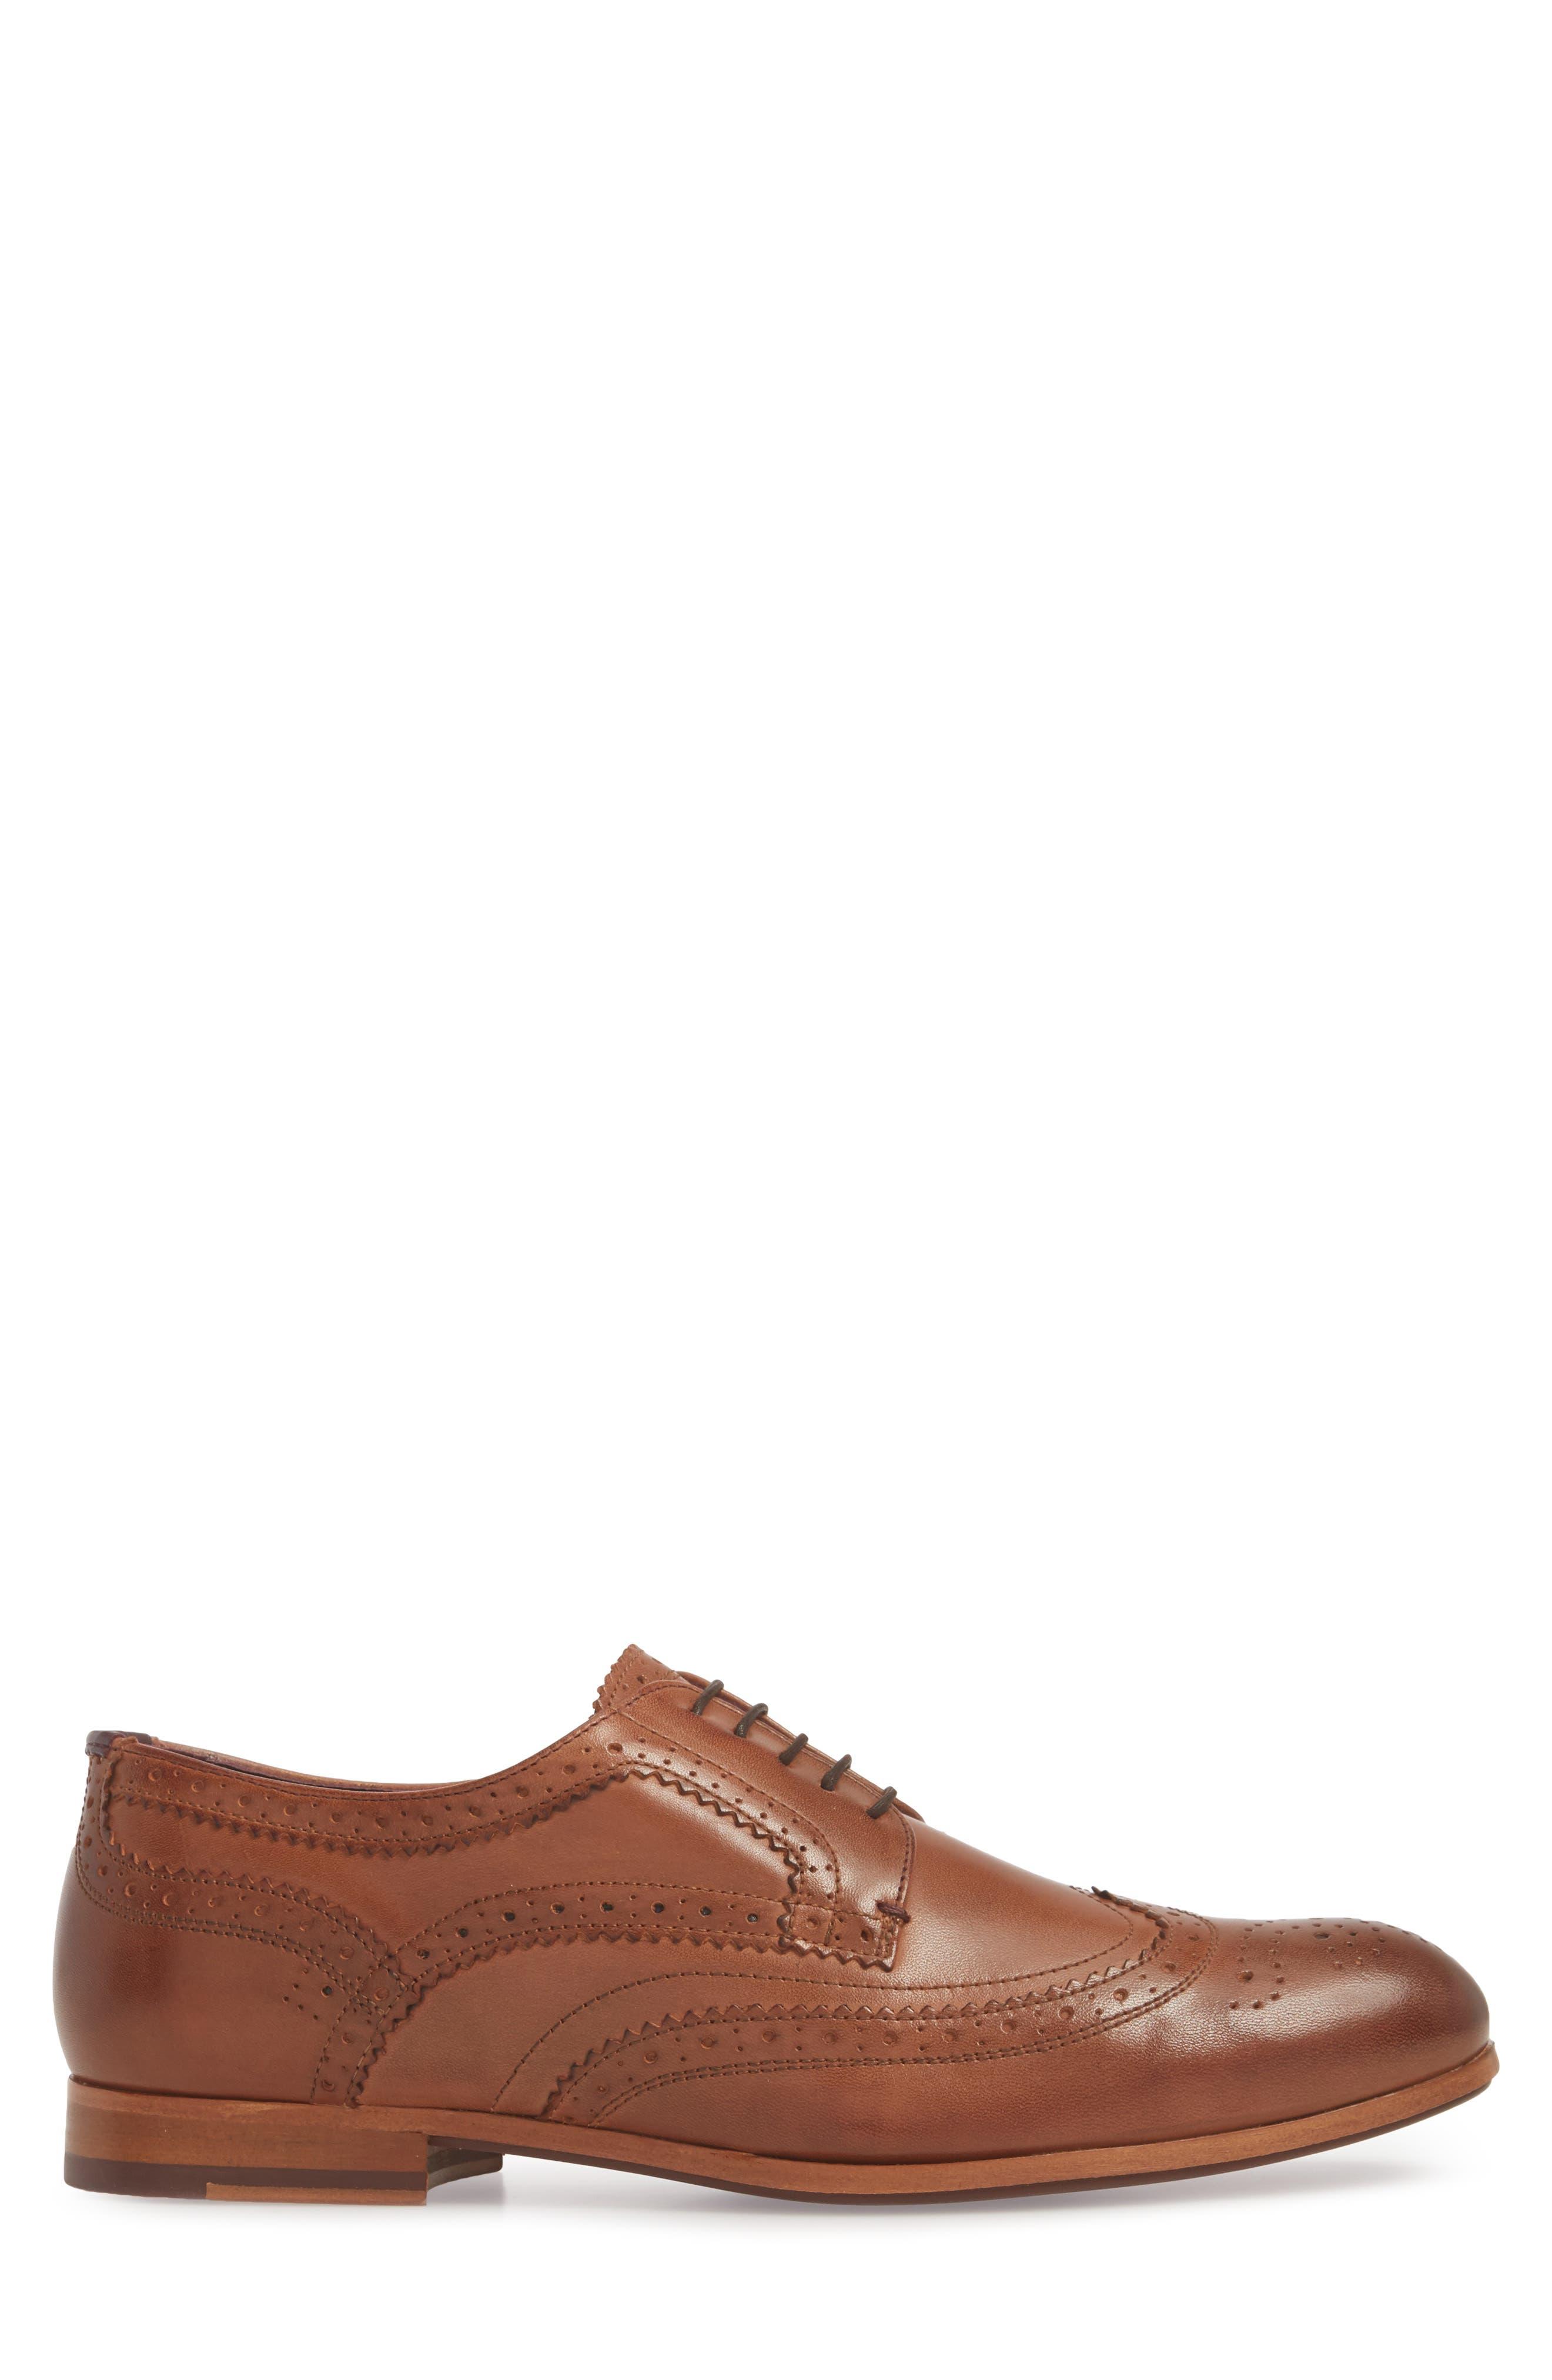 Camyli Wingtip,                             Alternate thumbnail 5, color,                             Tan Leather